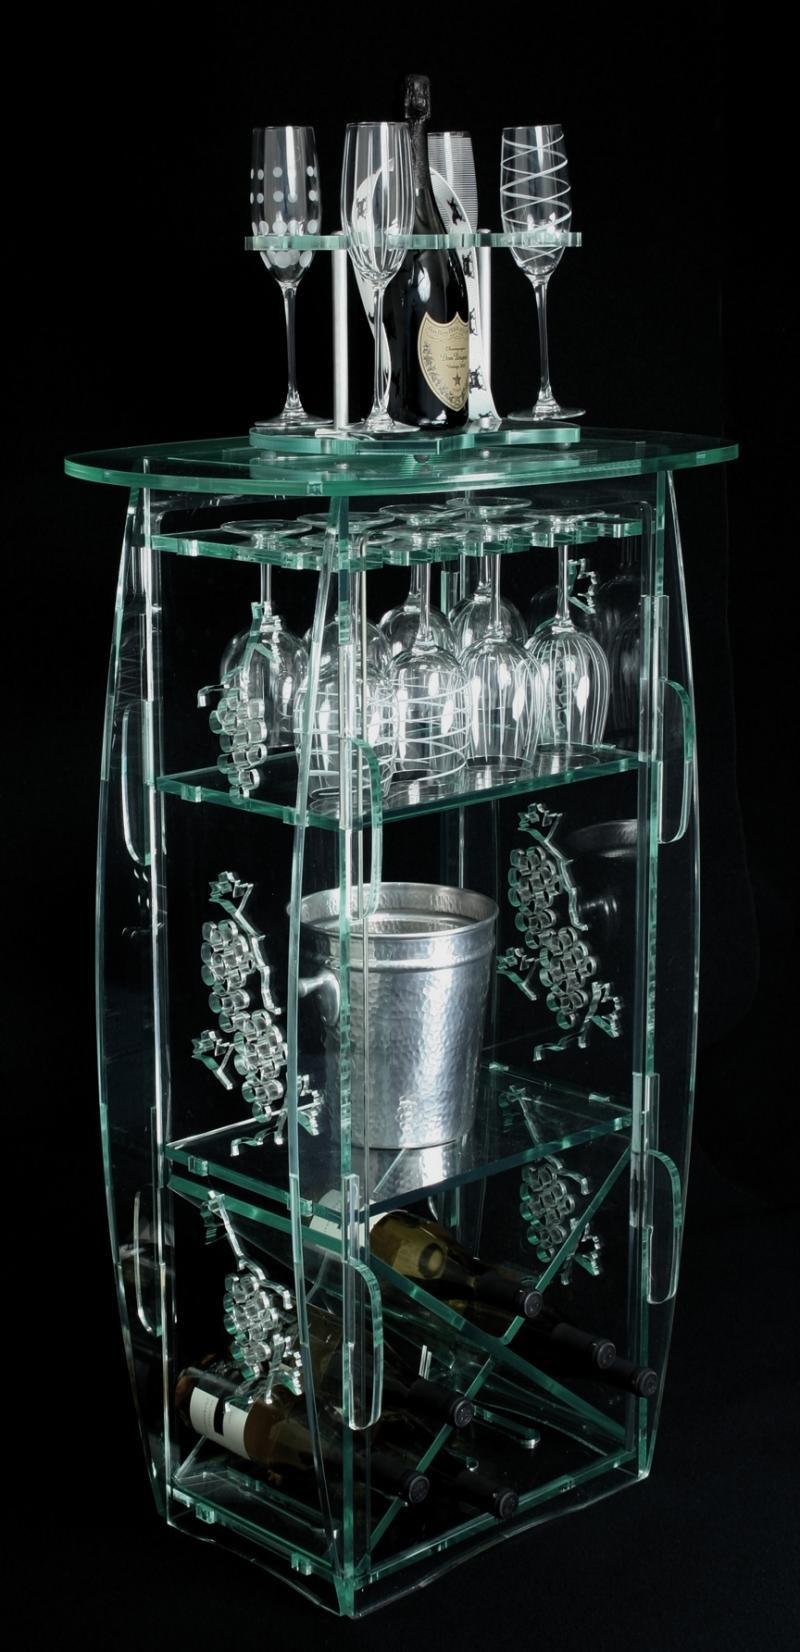 green edge glass acrylic wine bar champagne tote